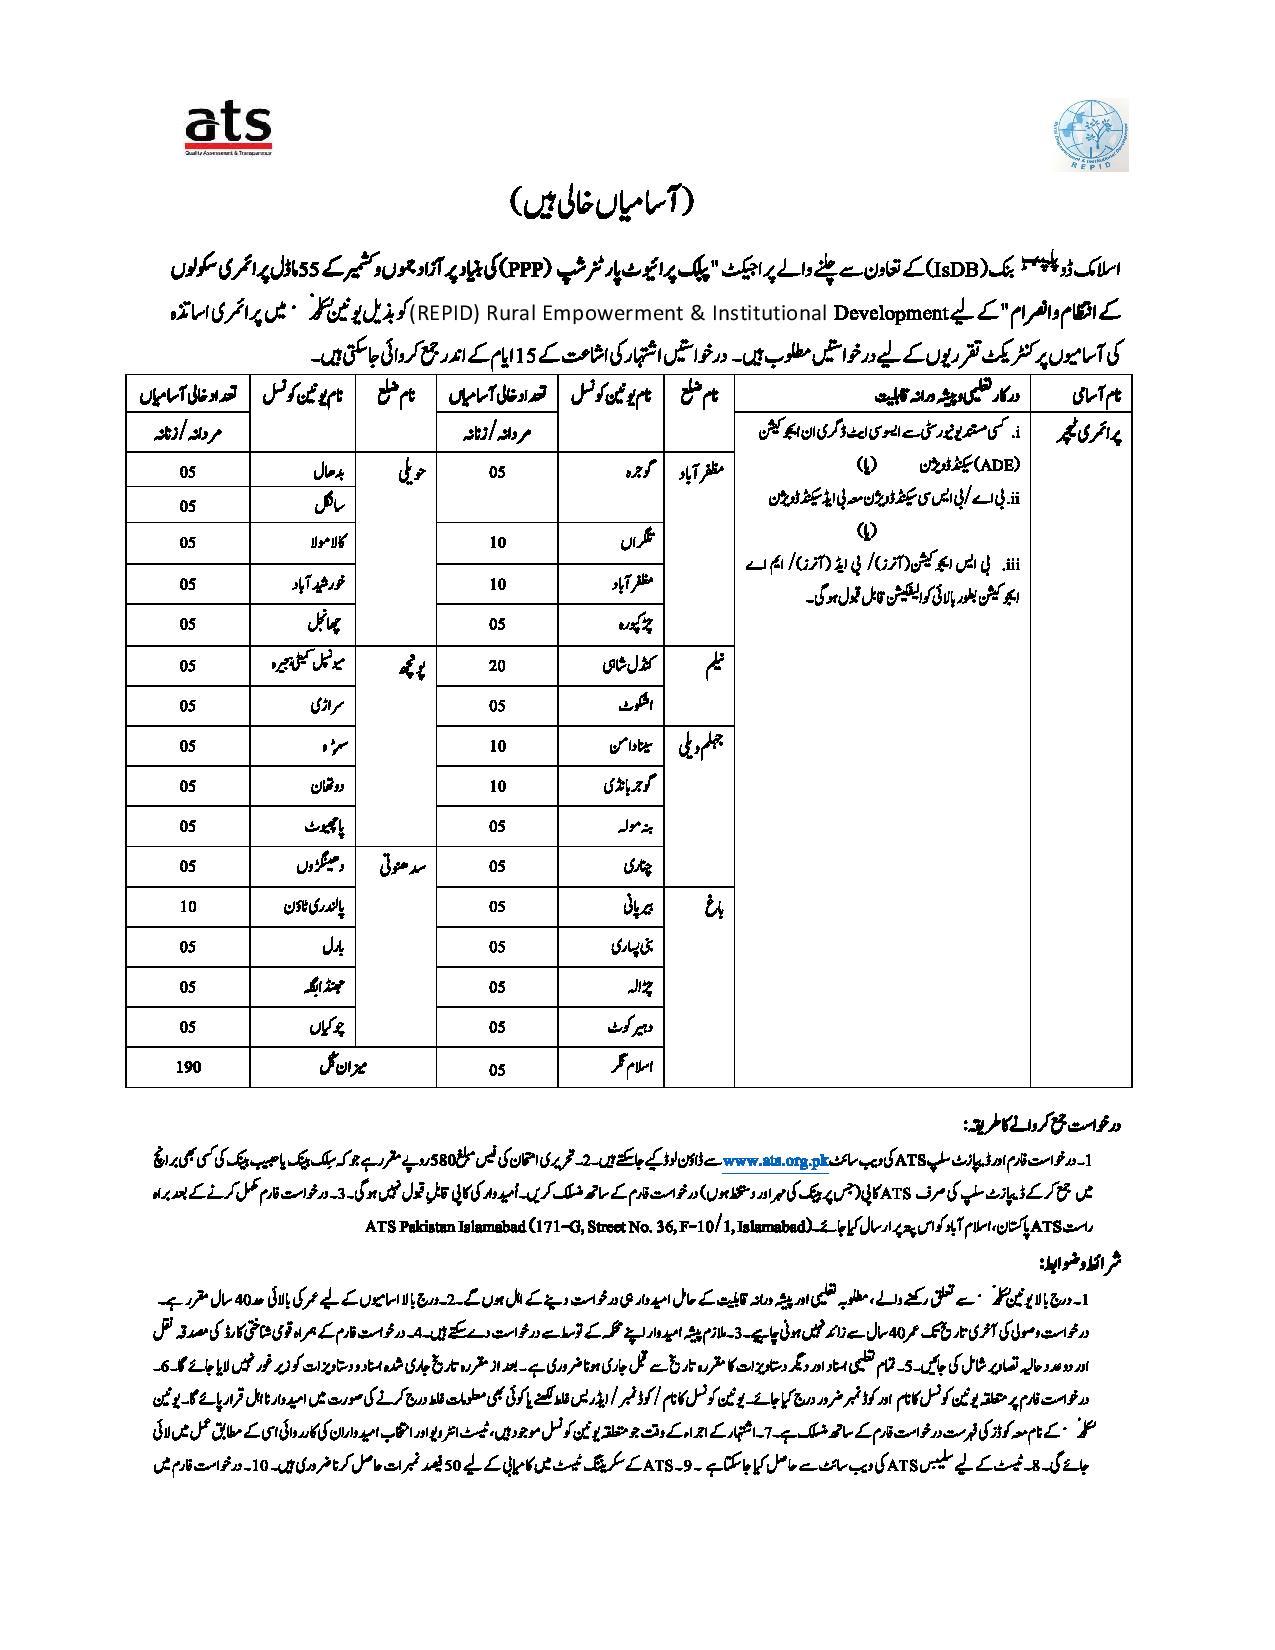 AJK Azad Jammu Kashmir Primary Teacher Jobs ATS Roll No Slip